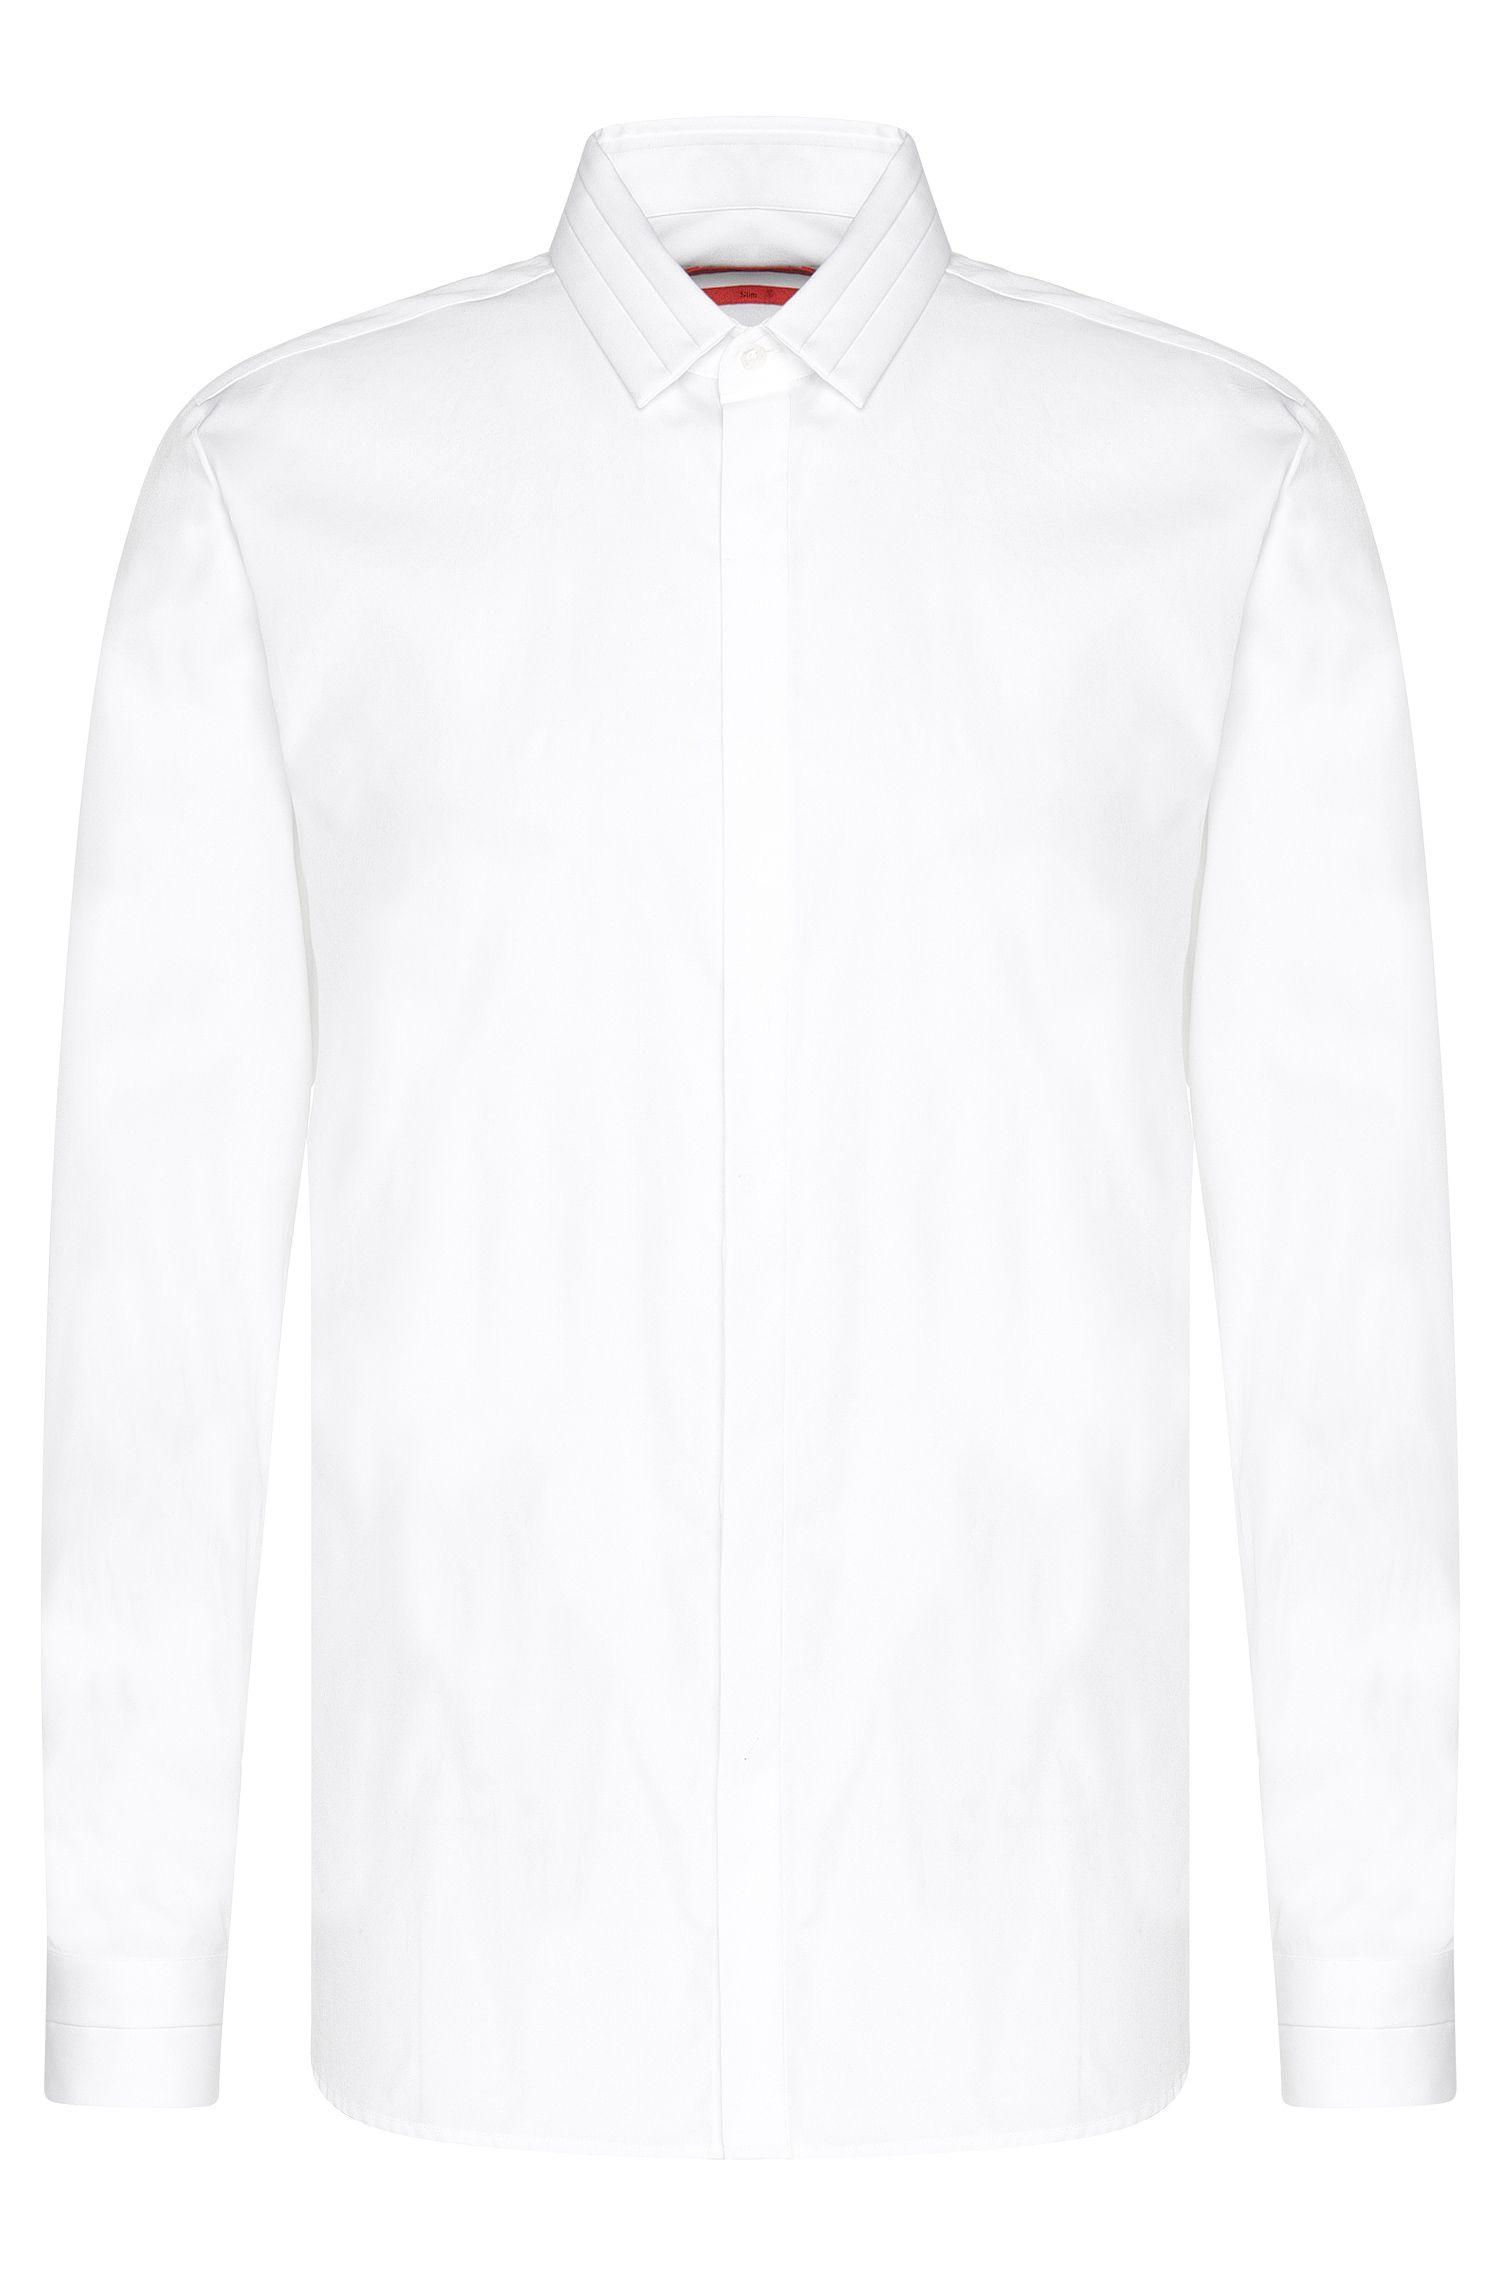 'Esid' | Slim Fit, Cotton Button Down Shirt